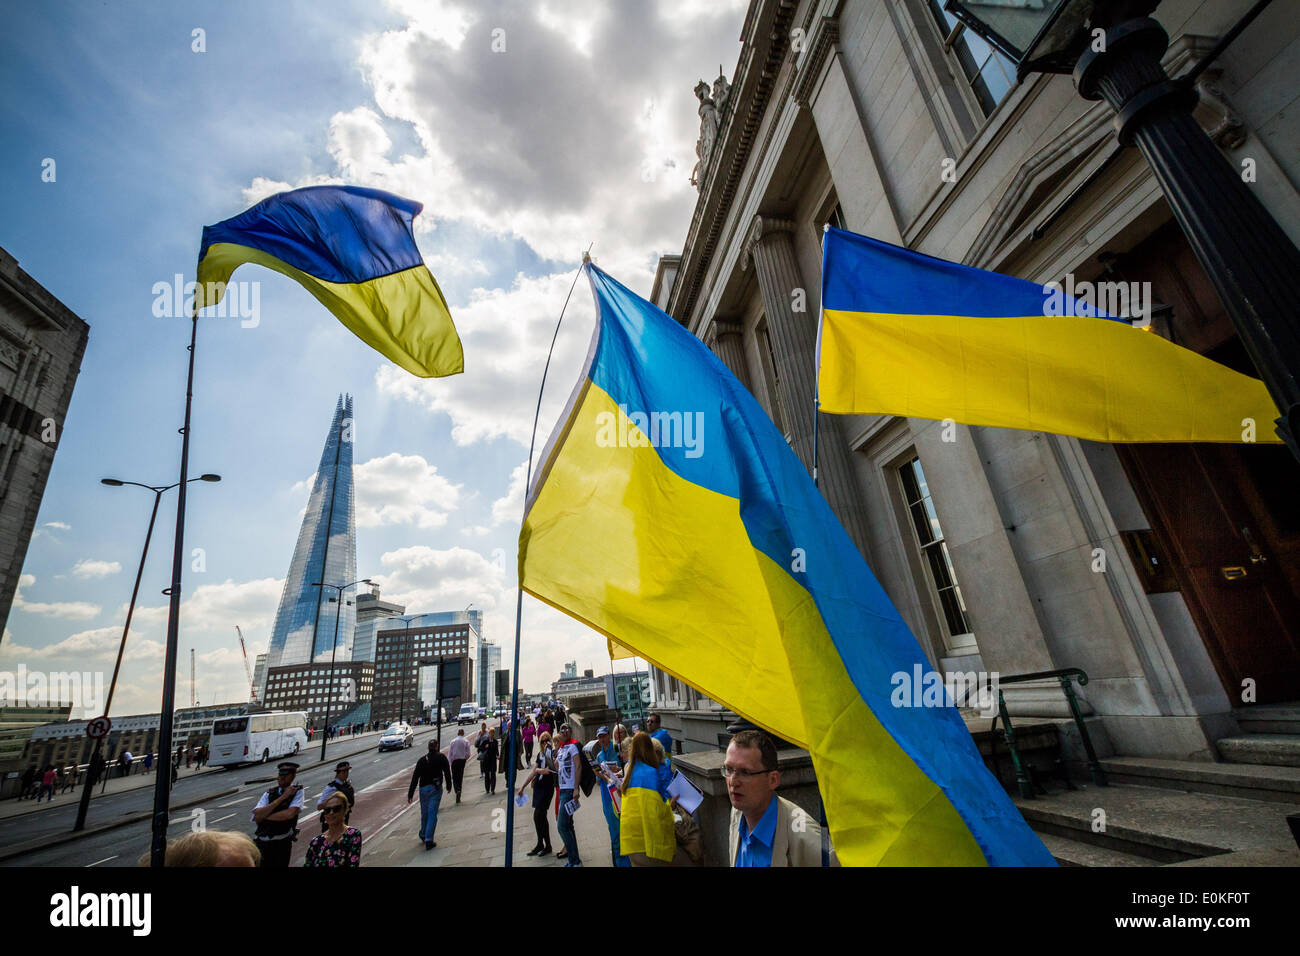 London, UK. 15th May, 2014. Euromaidan London: Ukrainian Protest against FTSE Accessing Russia Credit:  Guy Corbishley/Alamy Live News - Stock Image